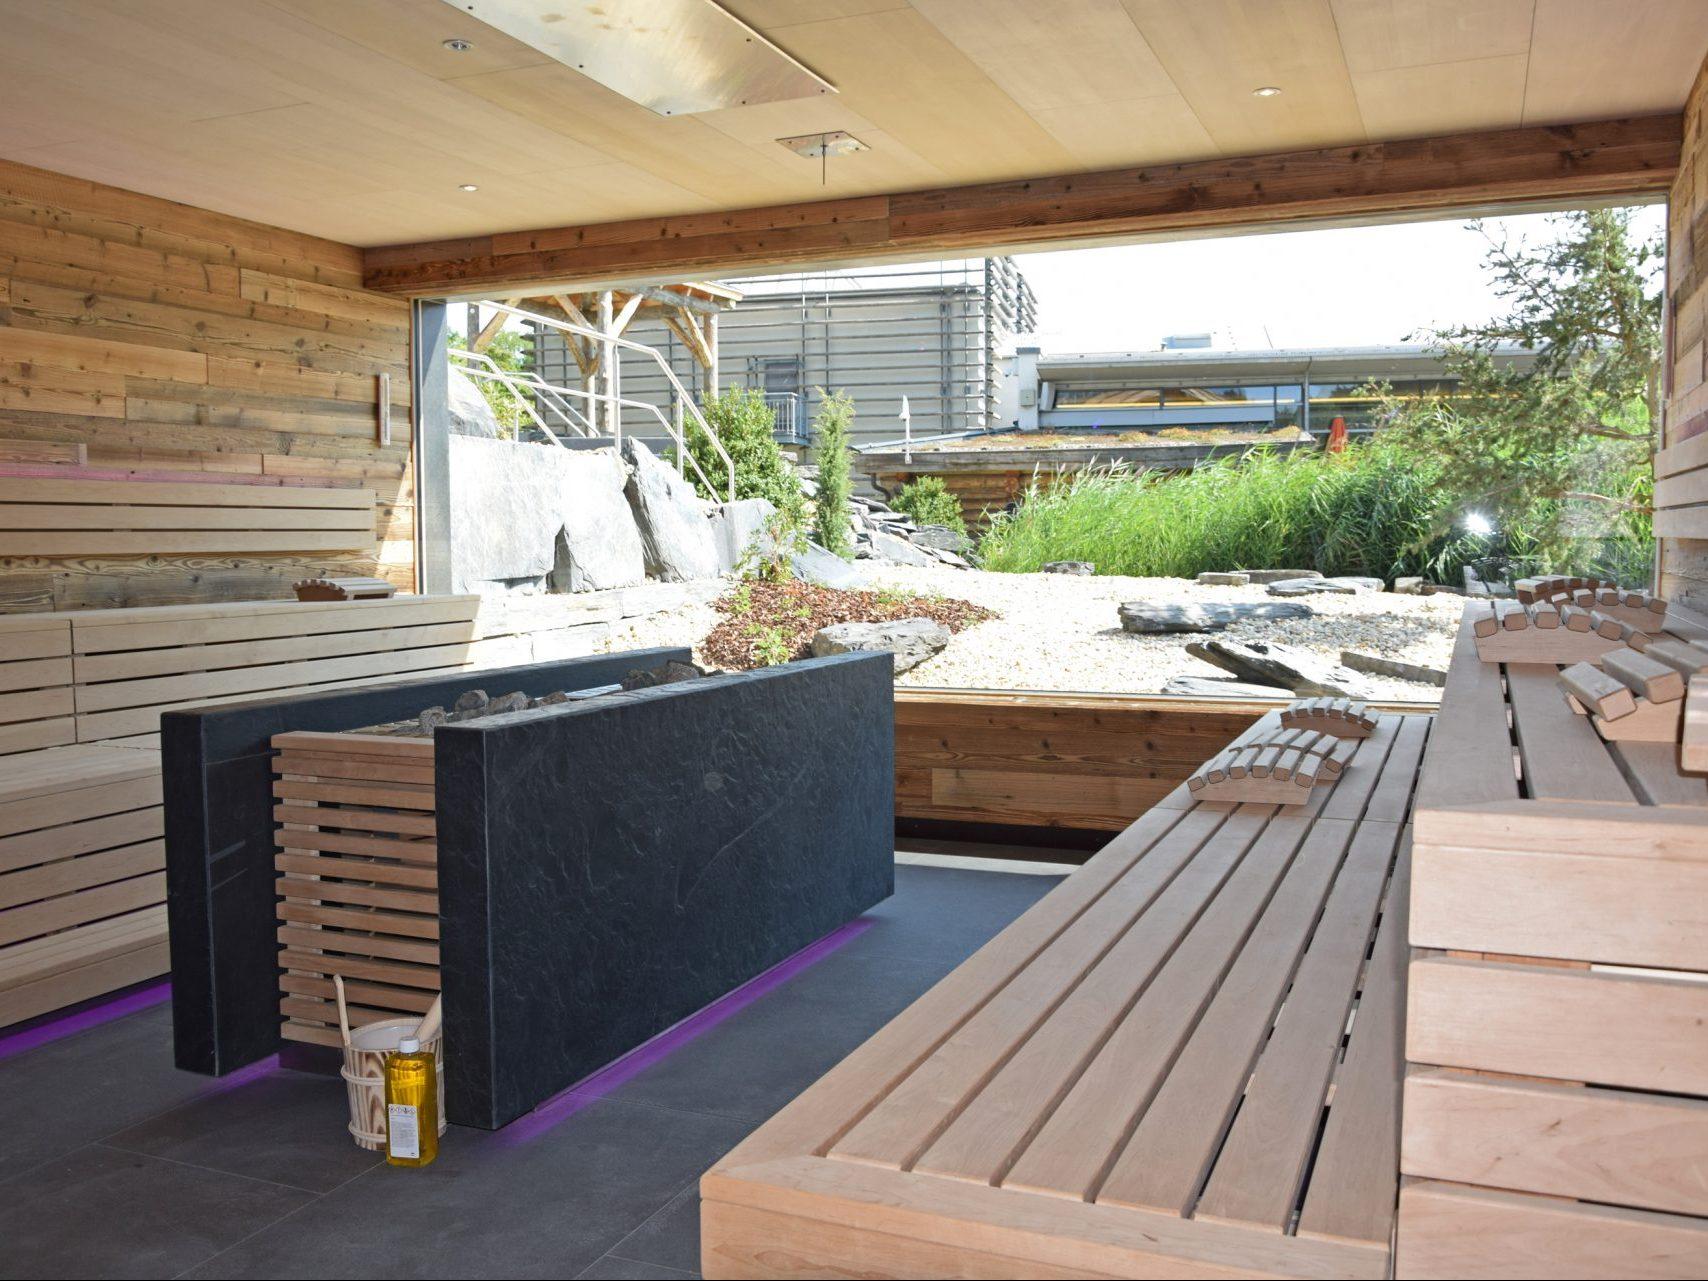 Panorama, Sauna, Therme, Bad Steben, Entspannung, Wellness, Arrangement, Pauschale